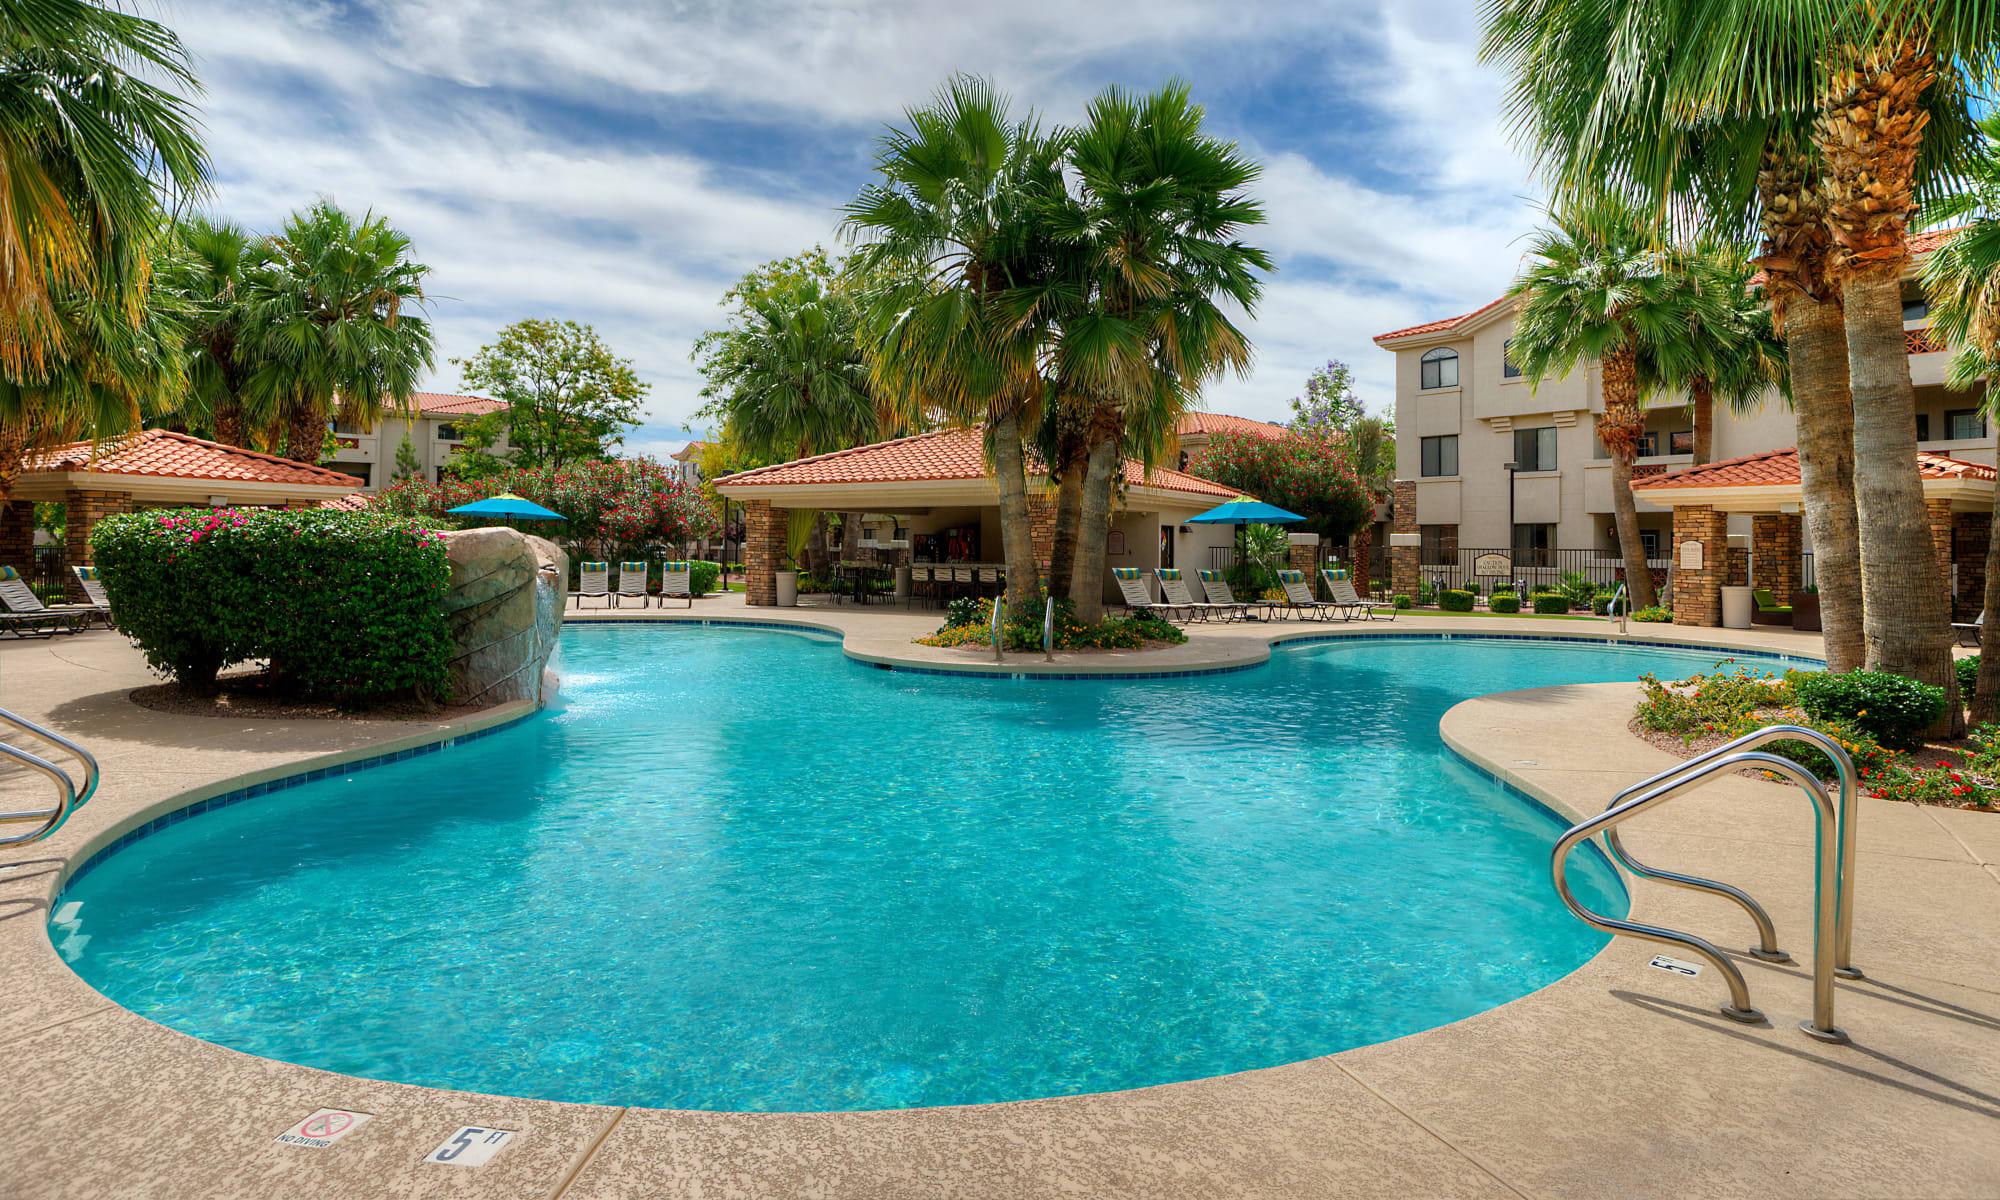 San Hacienda Apartments in Chandler, Arizona